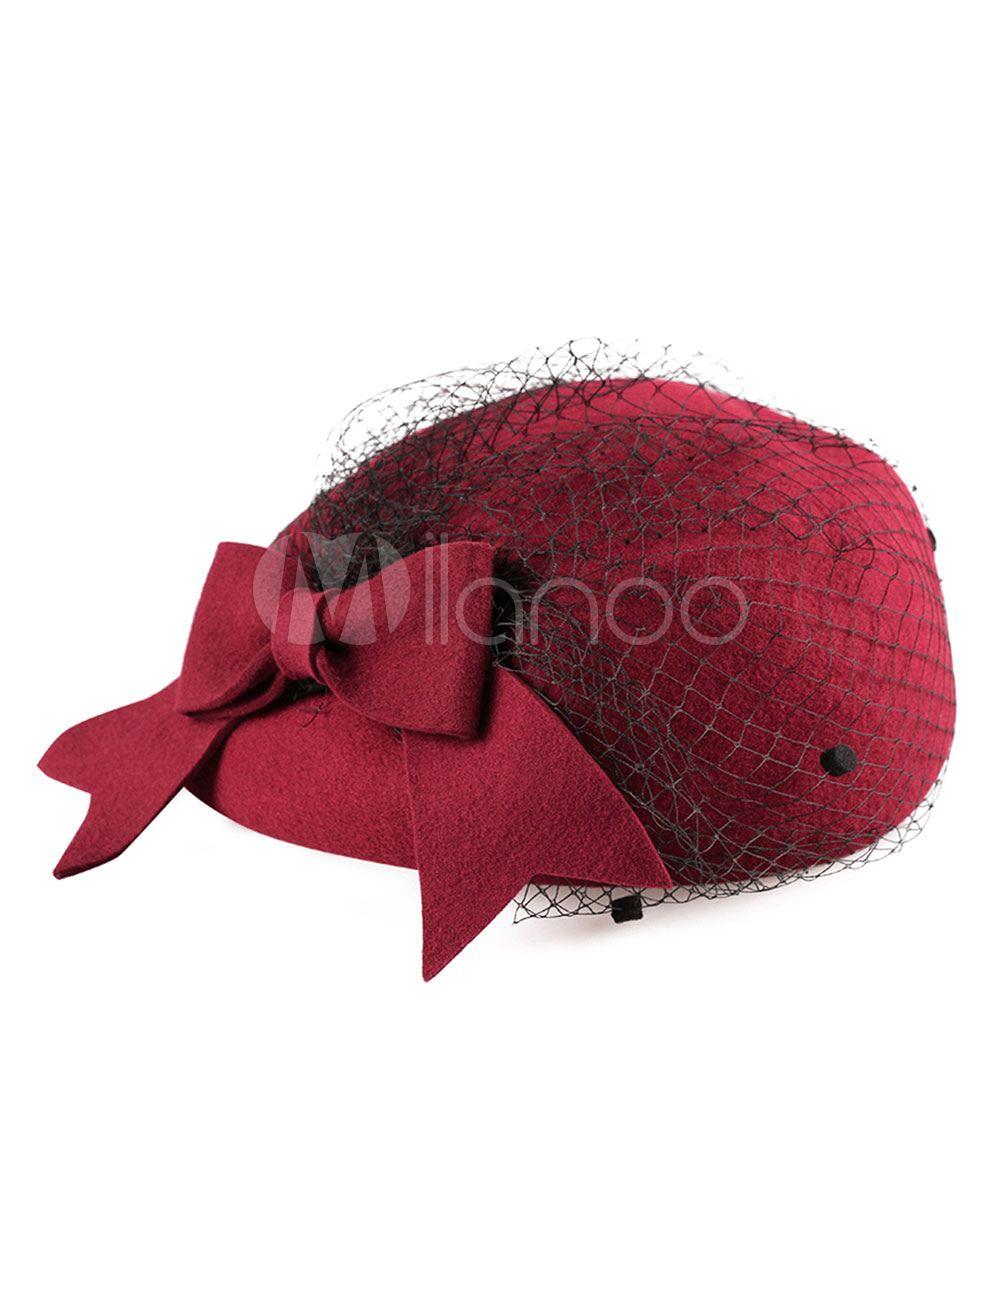 2f11f0b94 Vintage Hat Beret Women Wool Burgundy Winter Hat Retro Costume ...